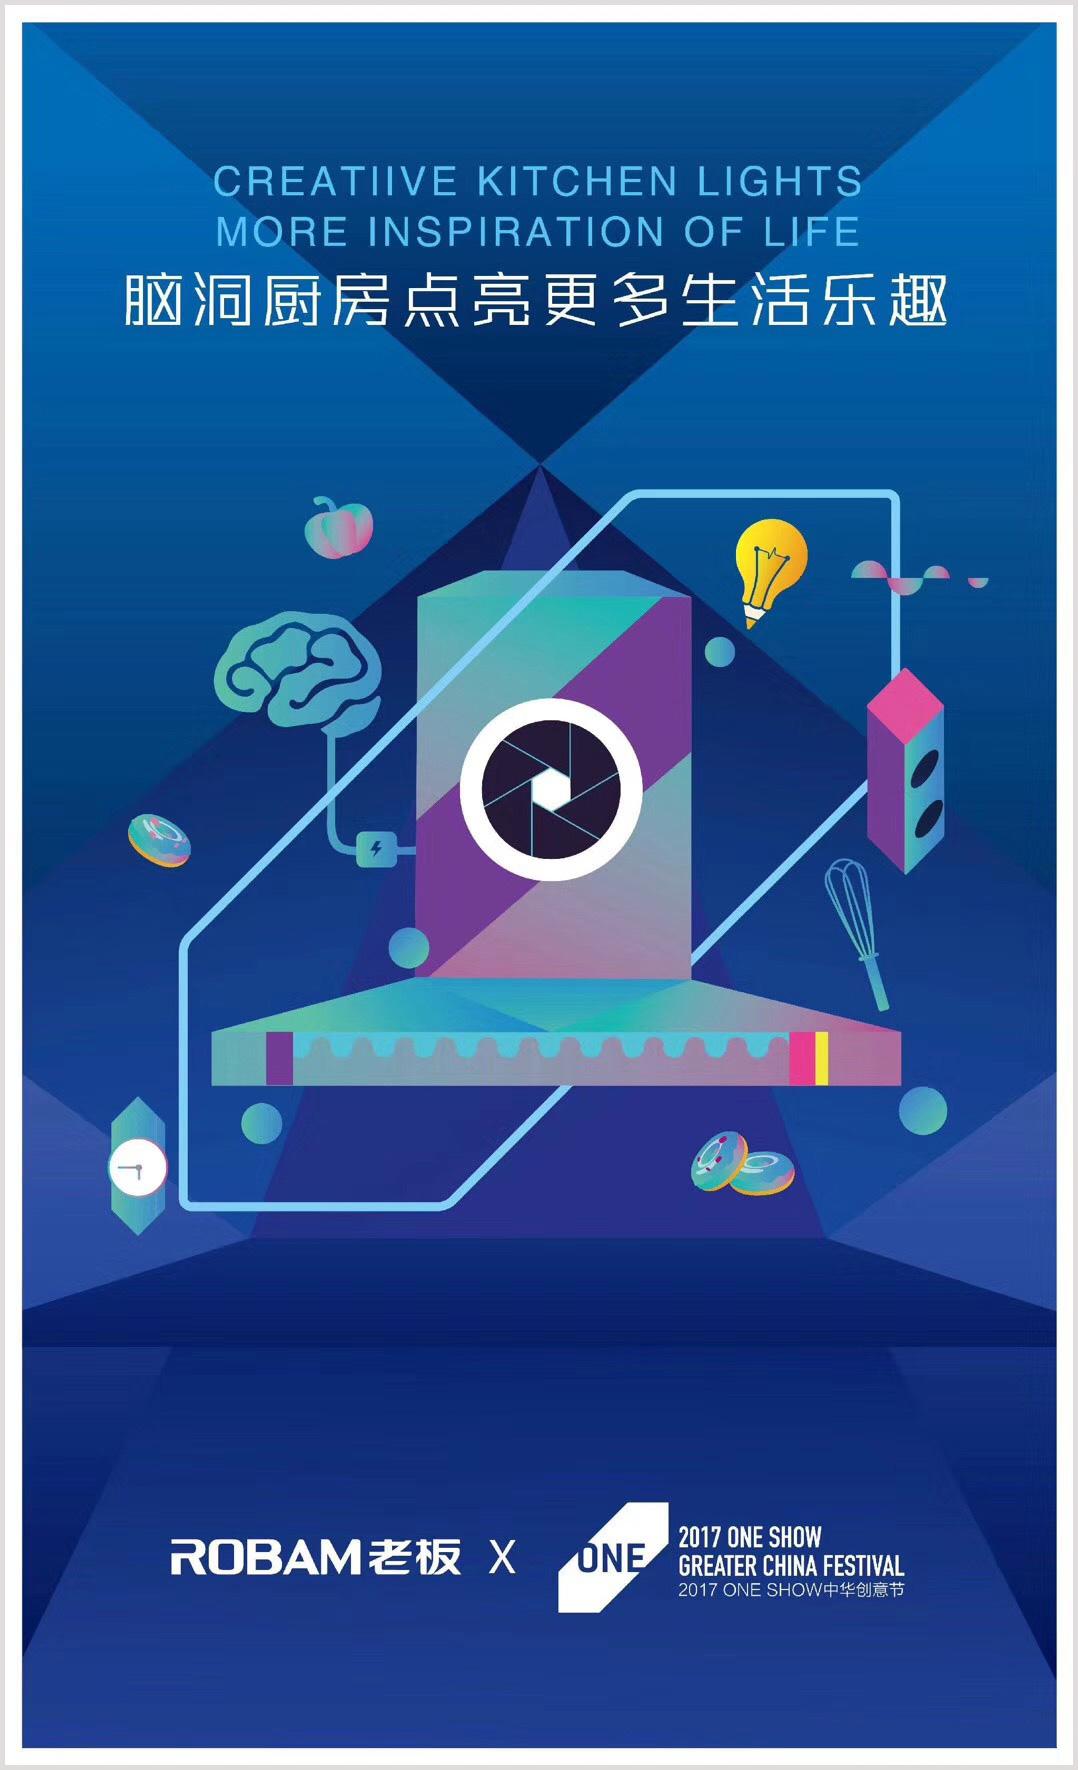 smart tv kitchen clear glass pendant lights for island 今年one show跨界15家品牌设计海报,为创意搞事情! - 数英